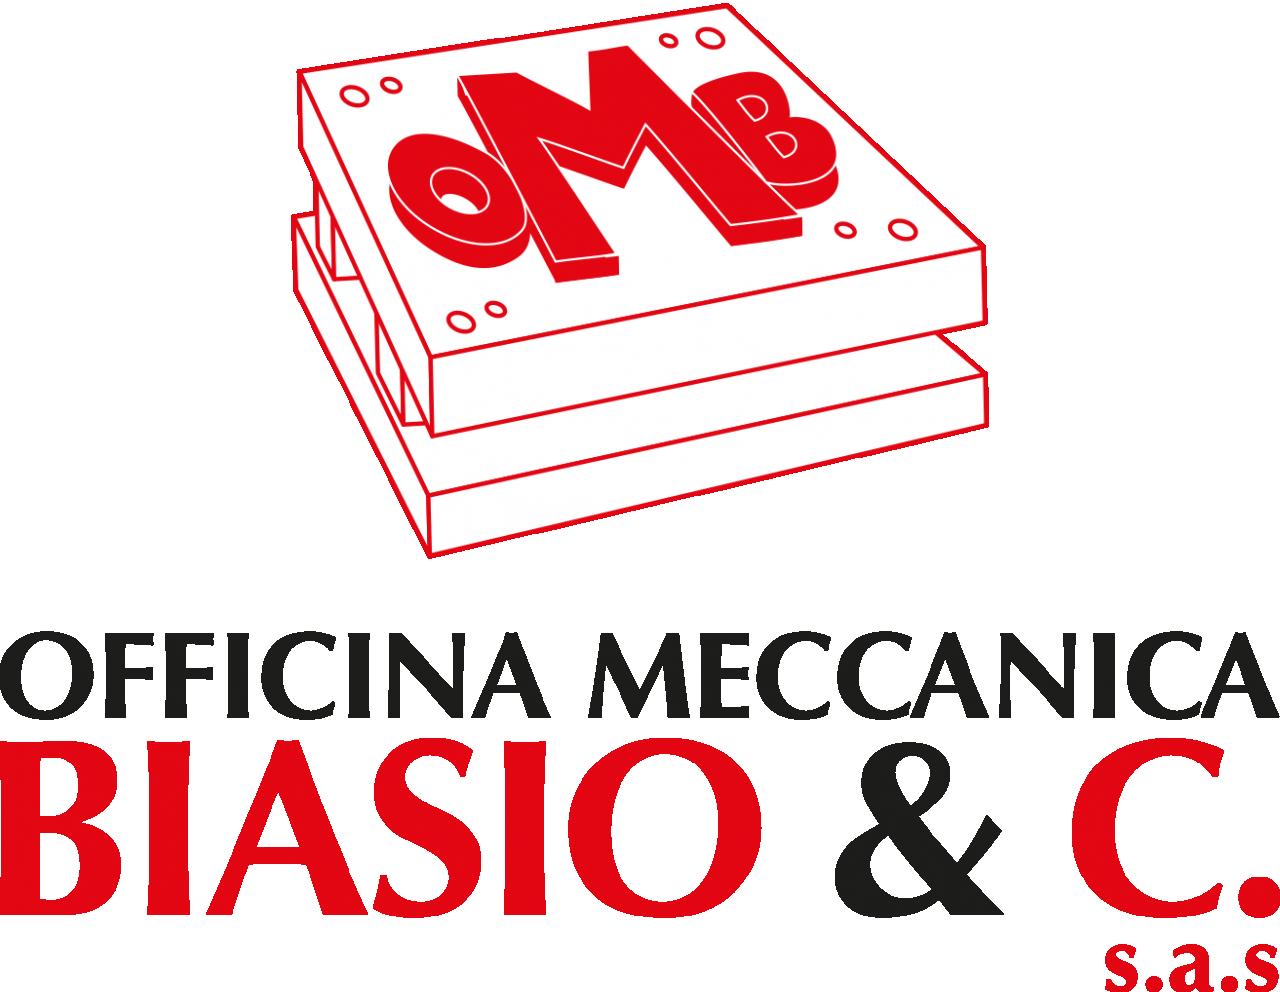 http://www.officinameccanicabiasio.com/